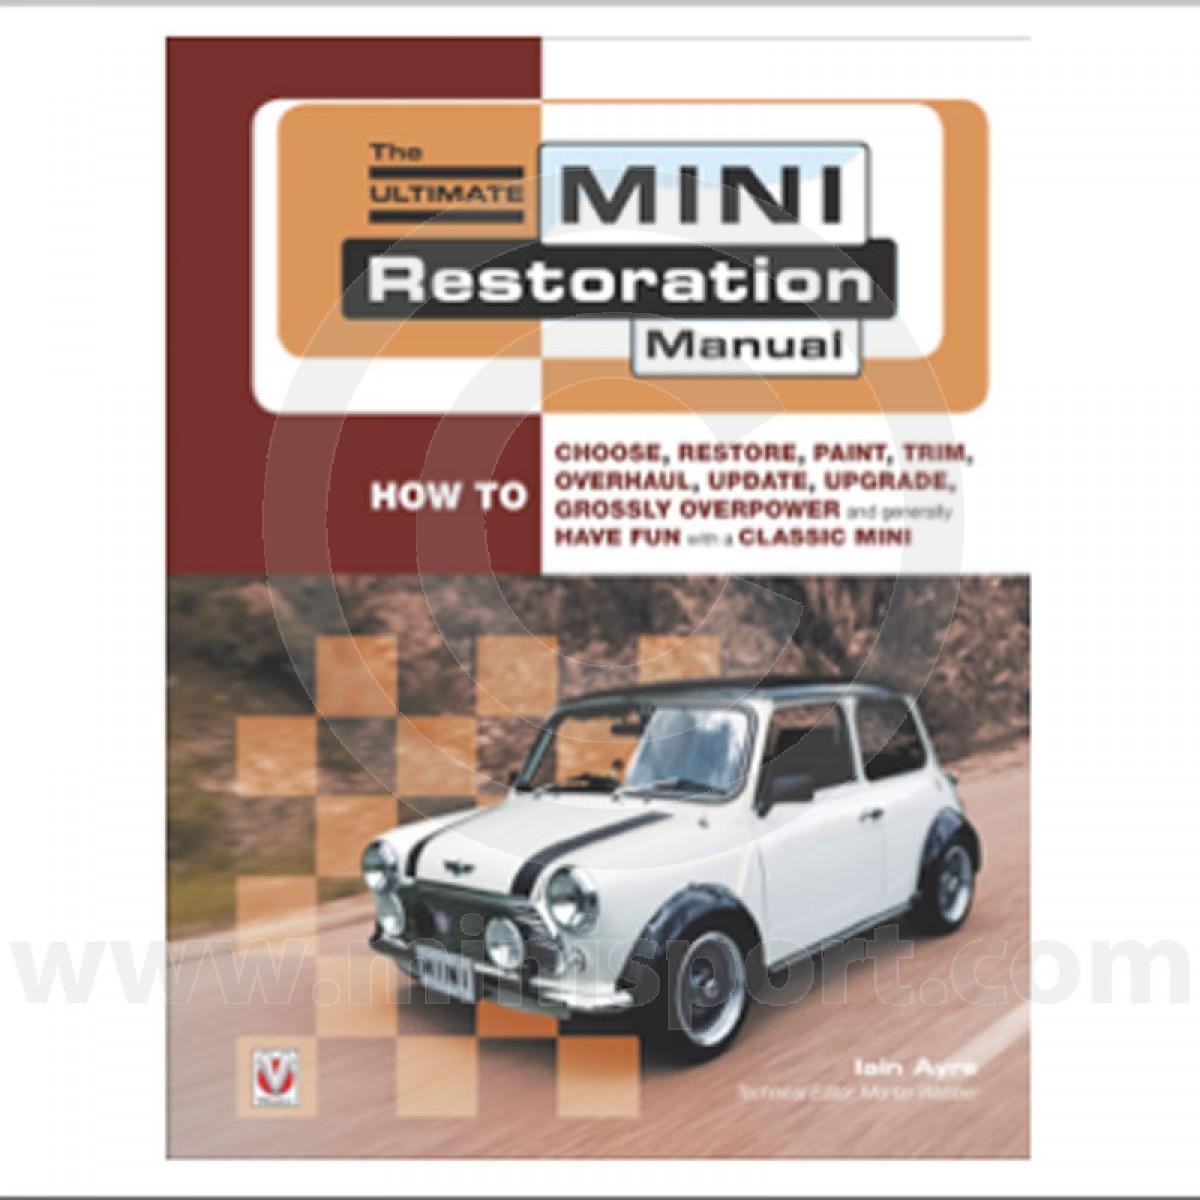 the ultimate mini restoration manual mini books manuals mini sport rh minisport com classic mini manual to automatic conversion classic mini manual washer pump